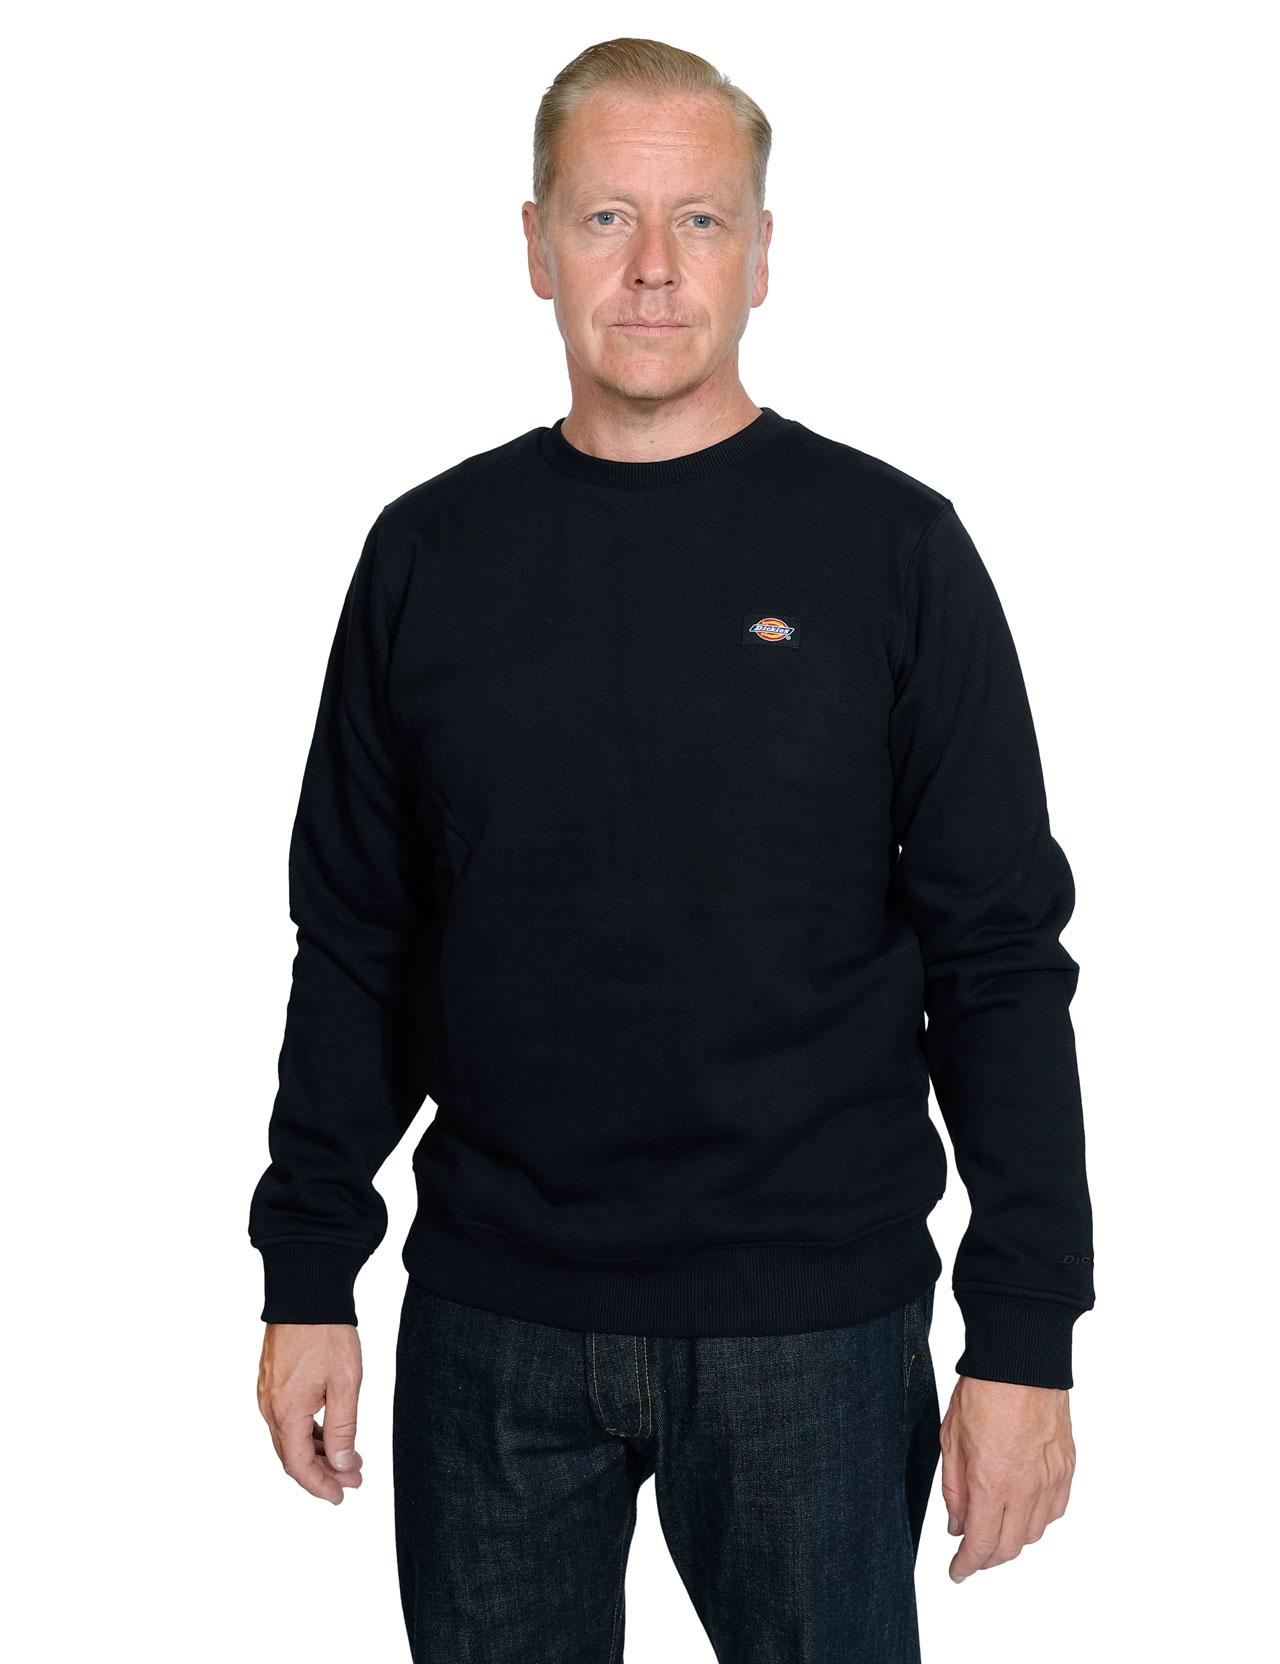 Dickies New Jersey Sweatshirt Black